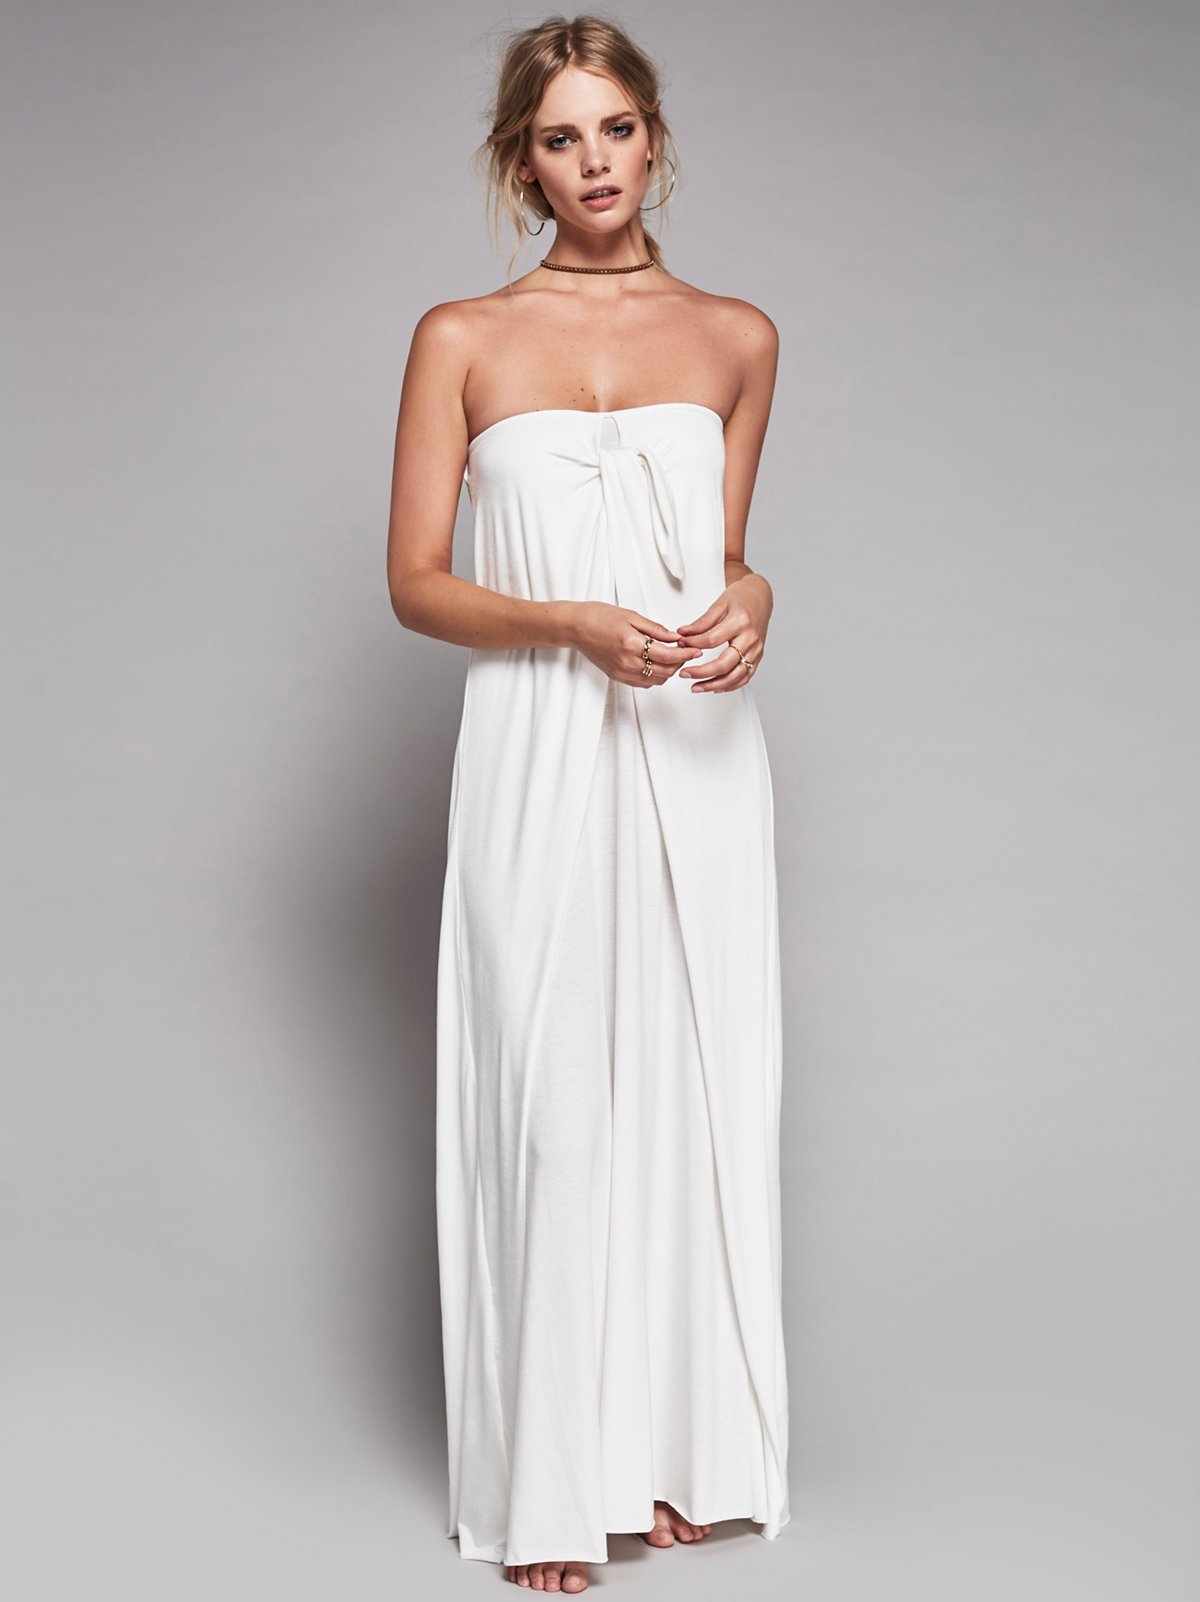 Bianca连衣裙